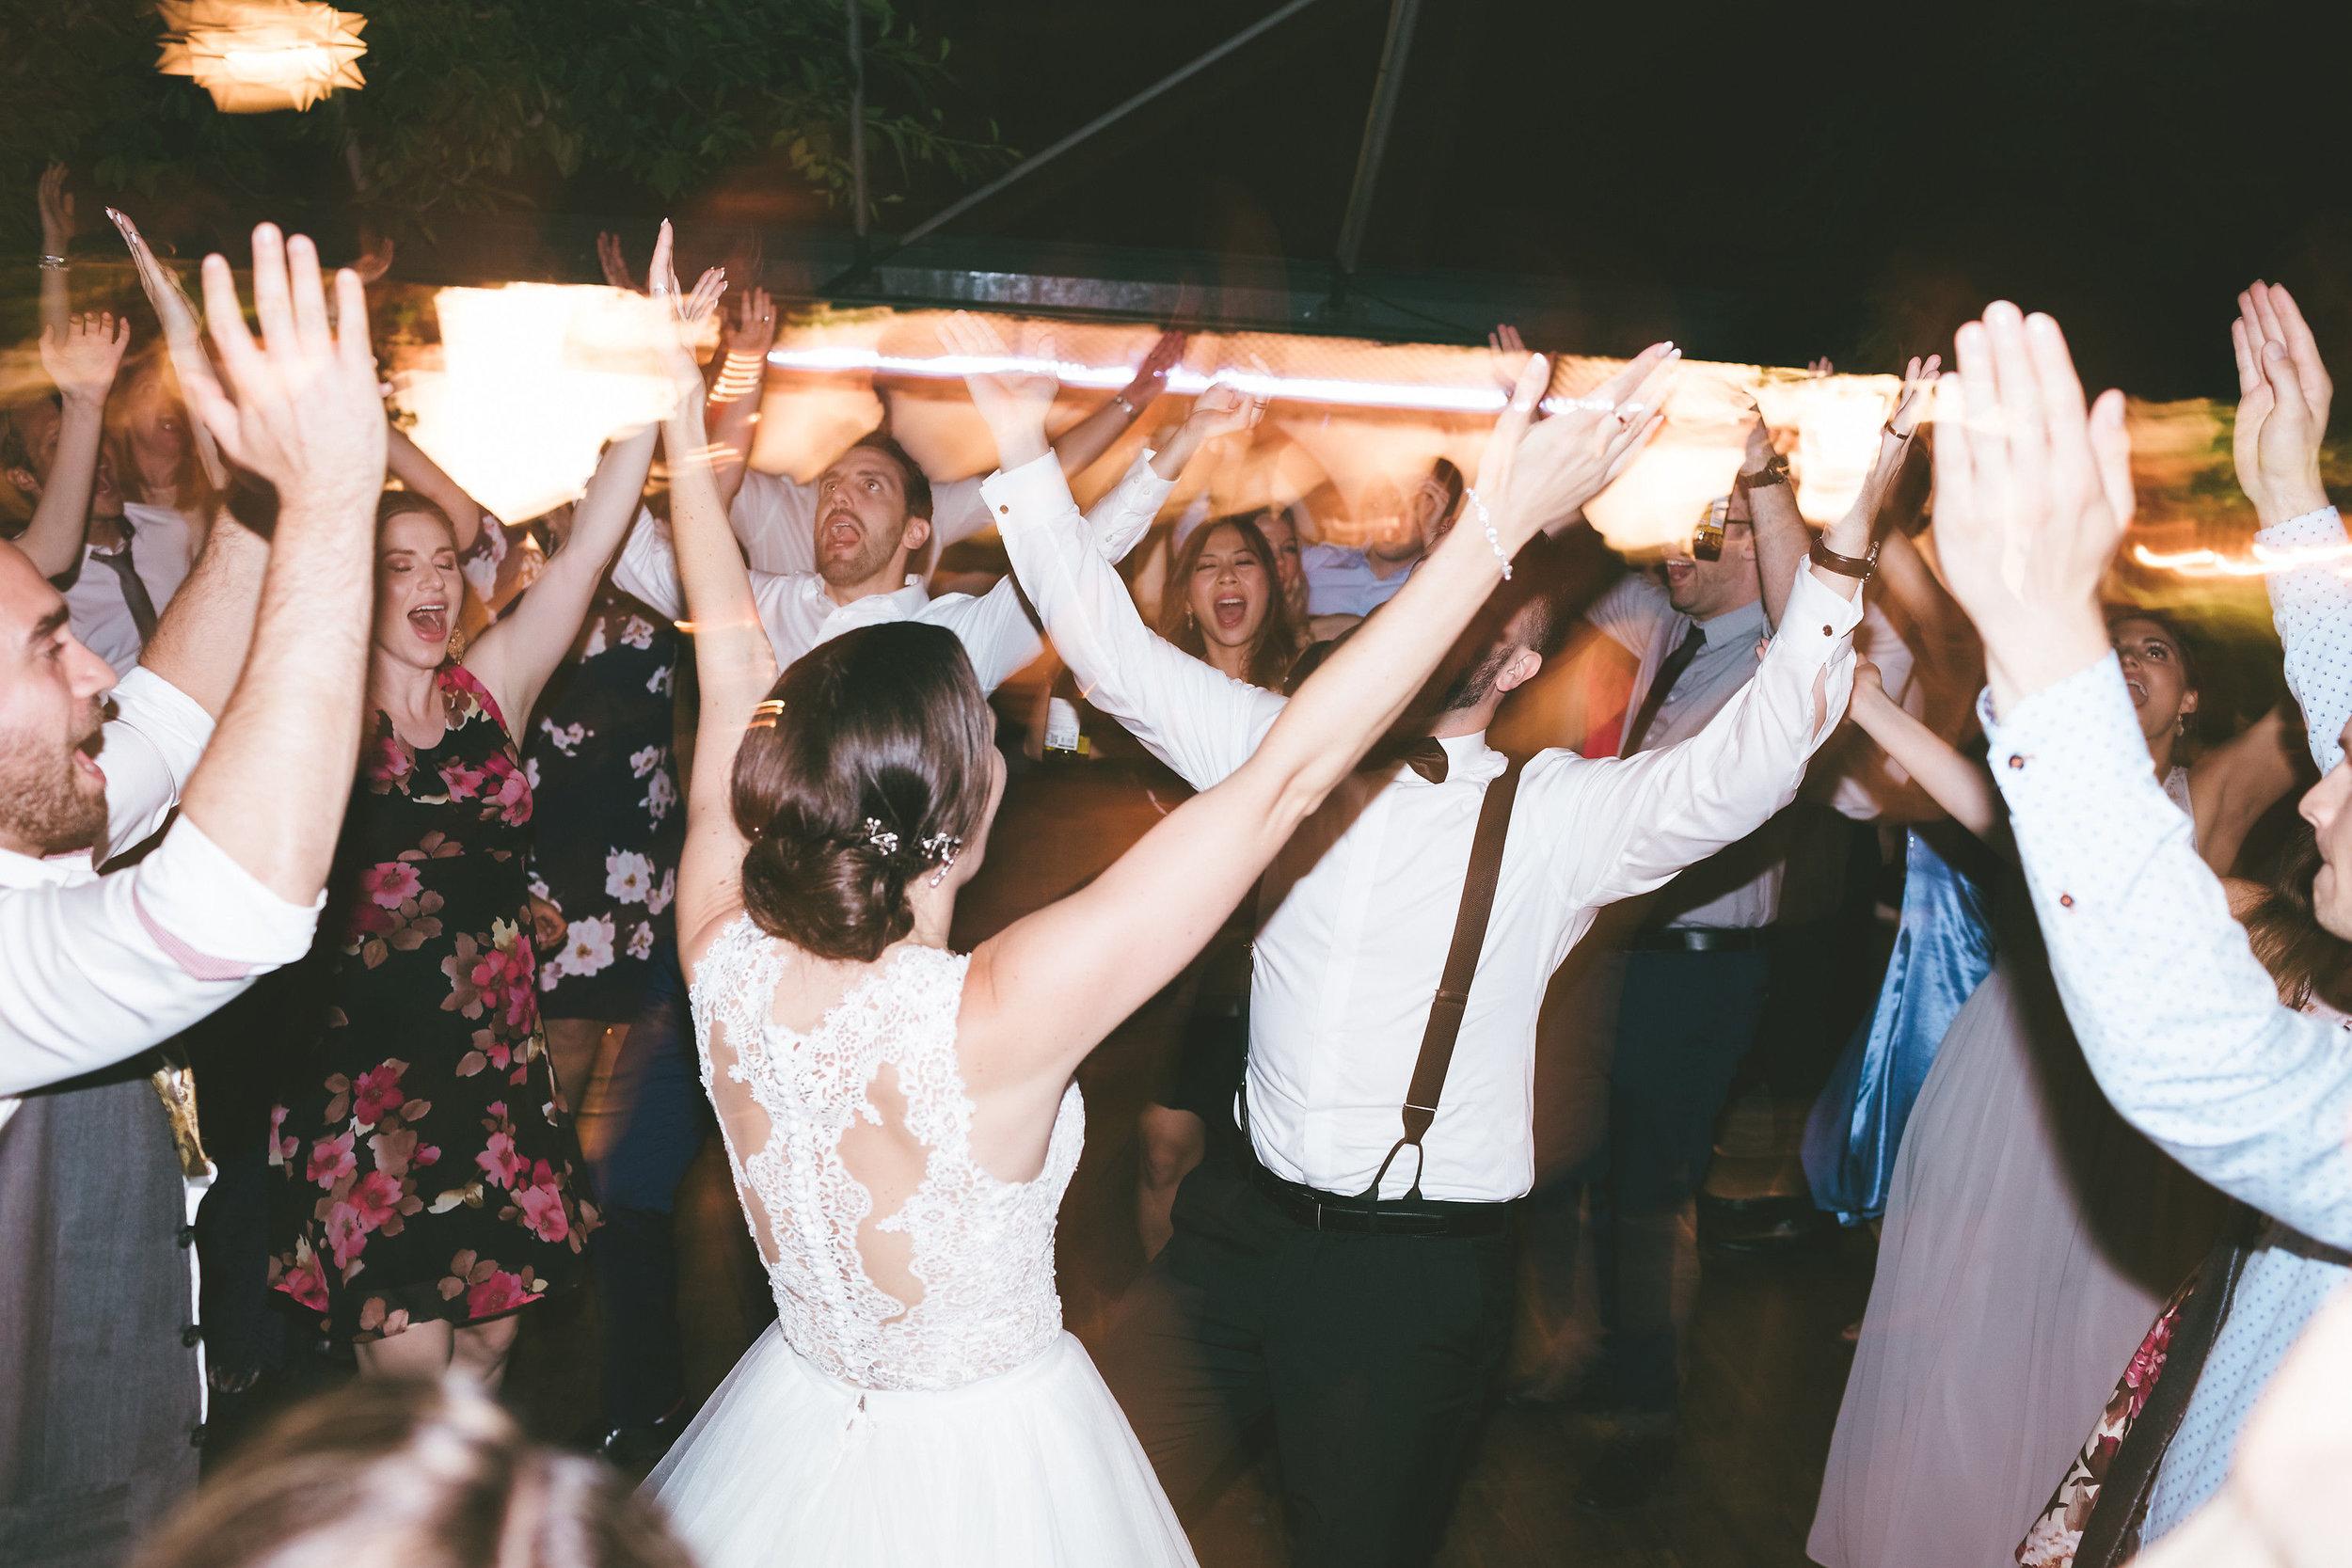 gosia___mike_wedding___lifesreel_danielcaruso___1745.jpg